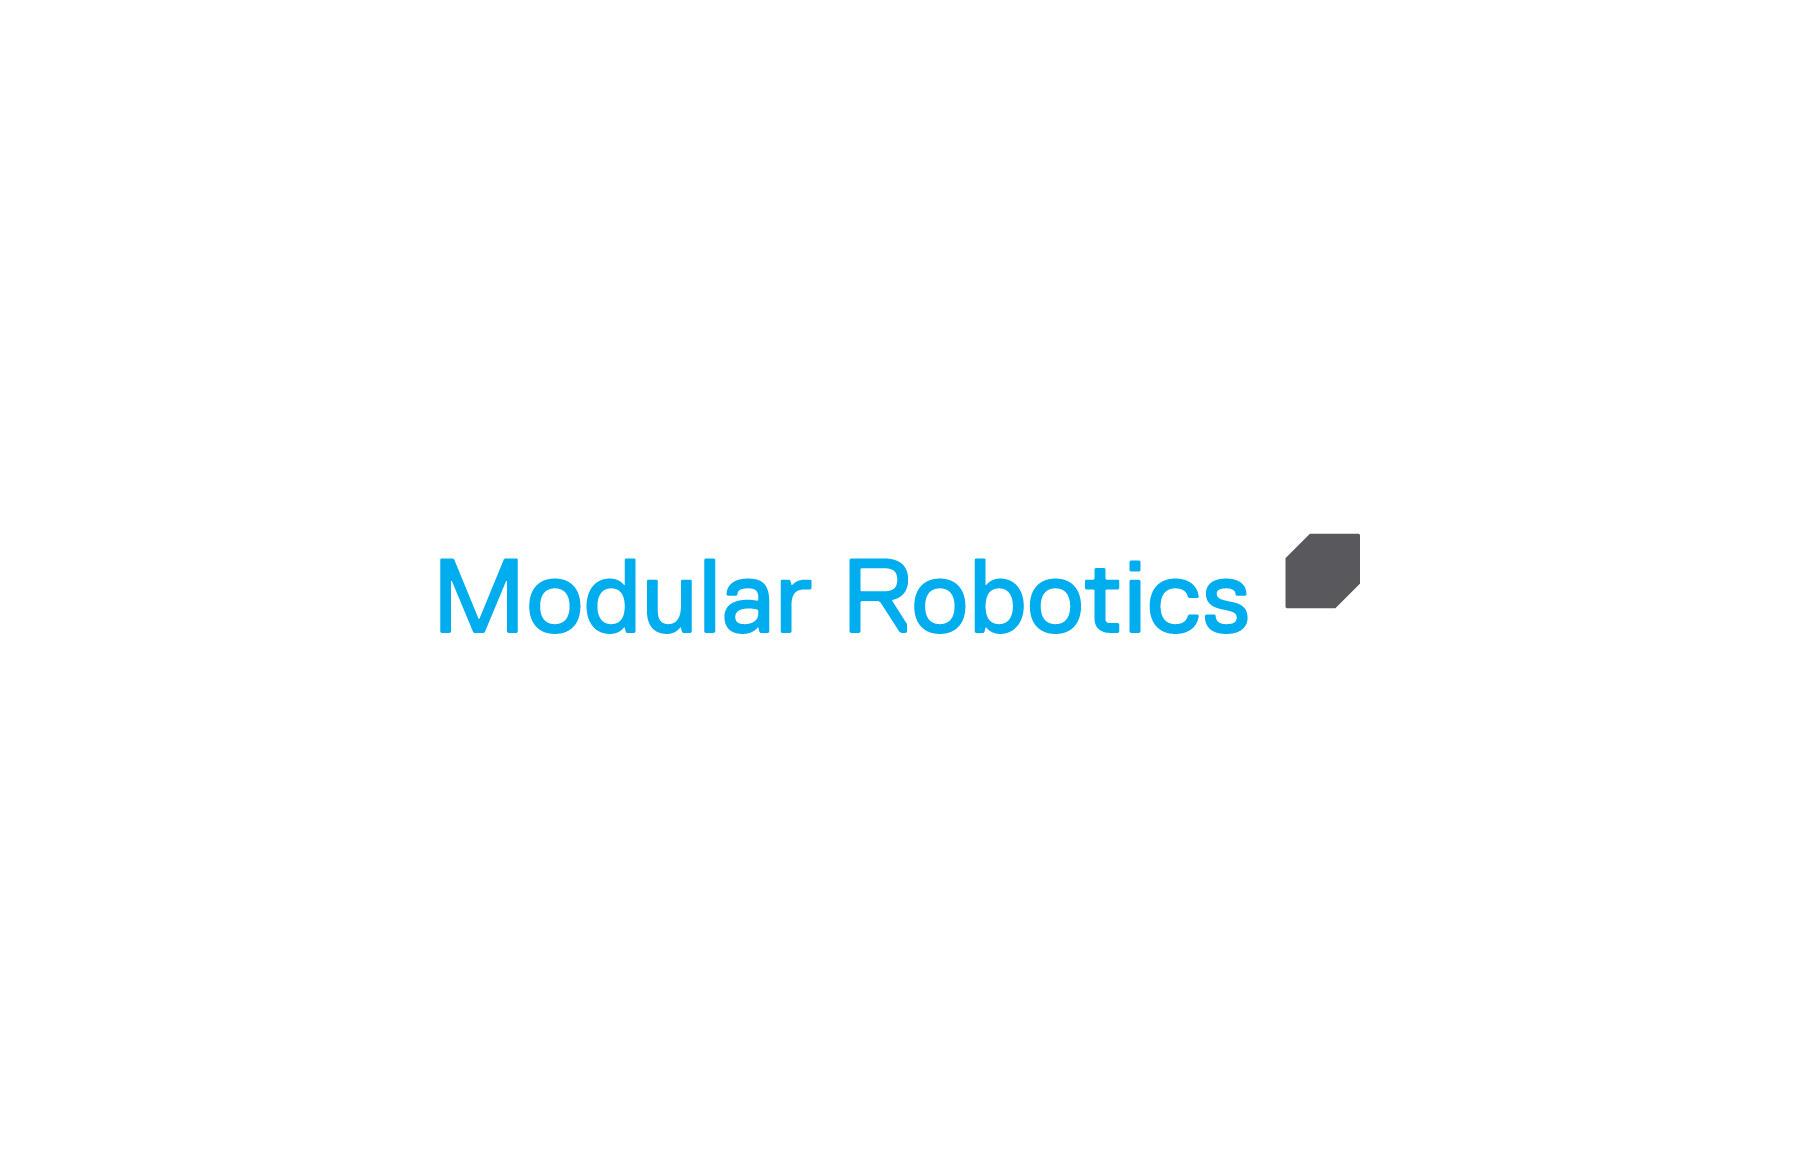 Modular Robotics — Berger & Föhr — Graphic Design & Art Direction